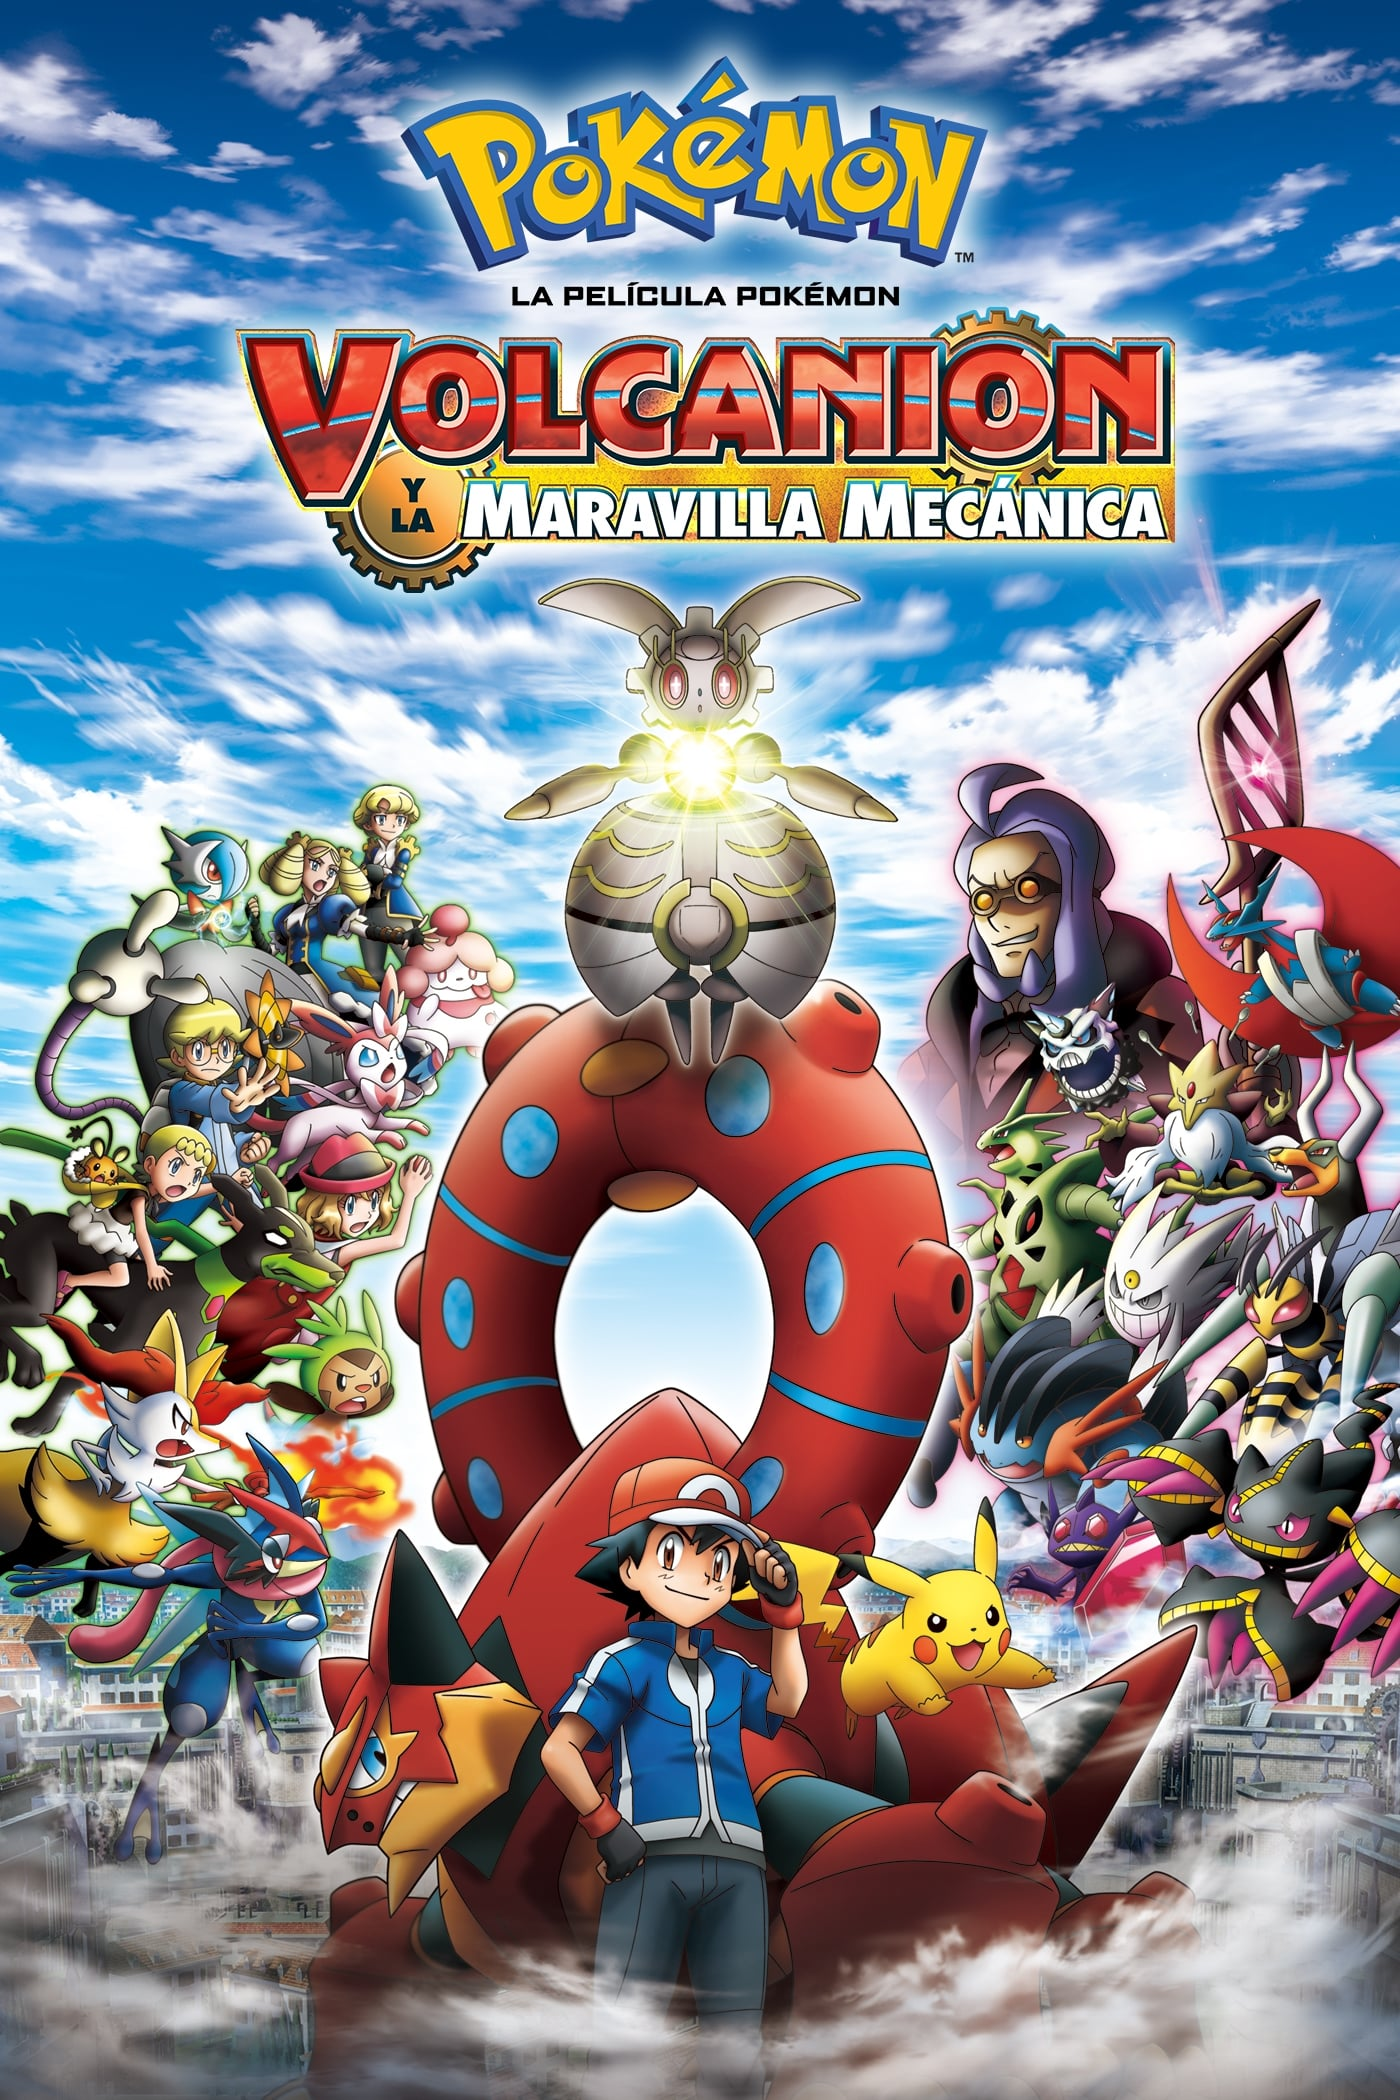 Pokémon: Volcanion y la maravilla mecánica